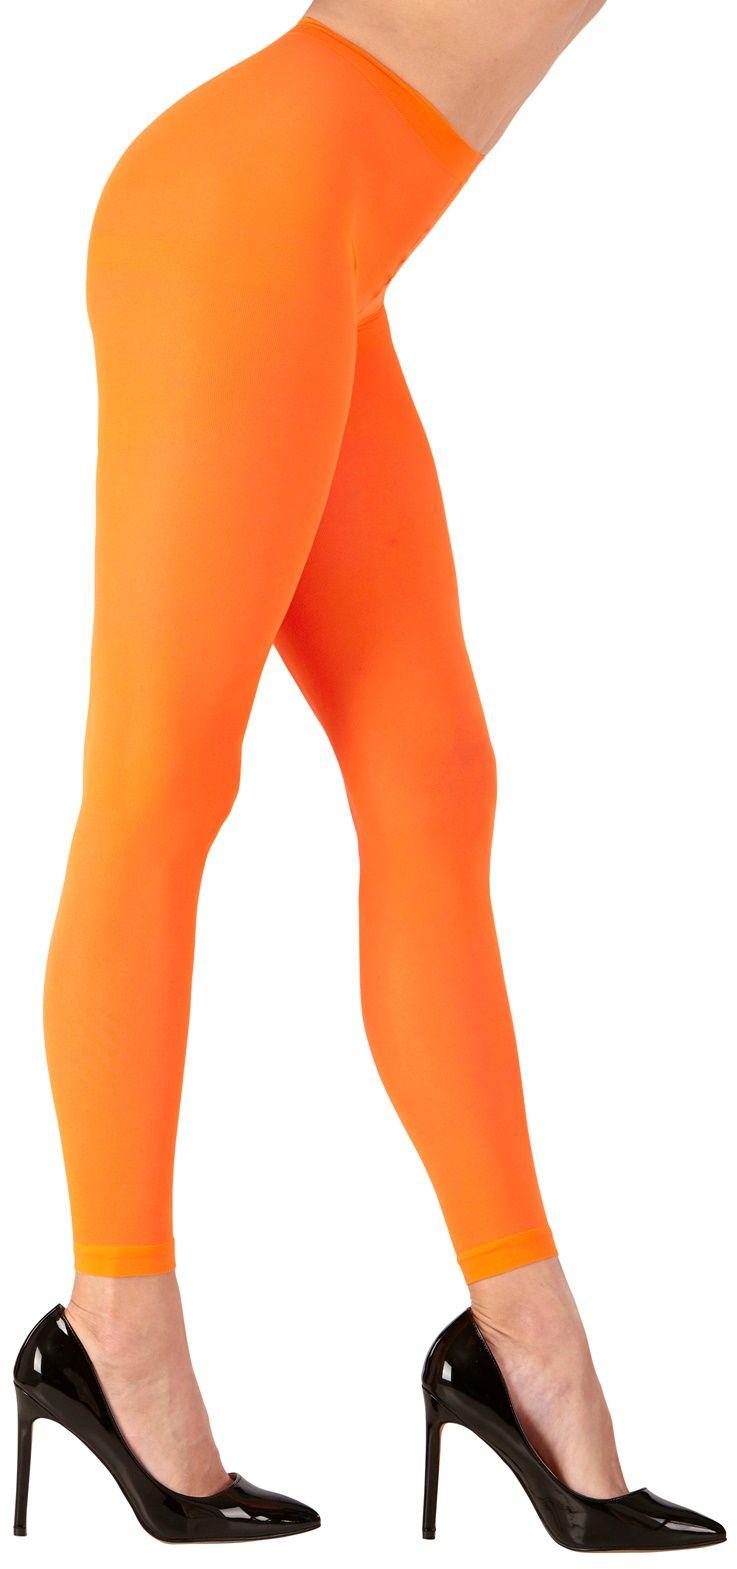 Neon oranje legging One-size-volwassenen